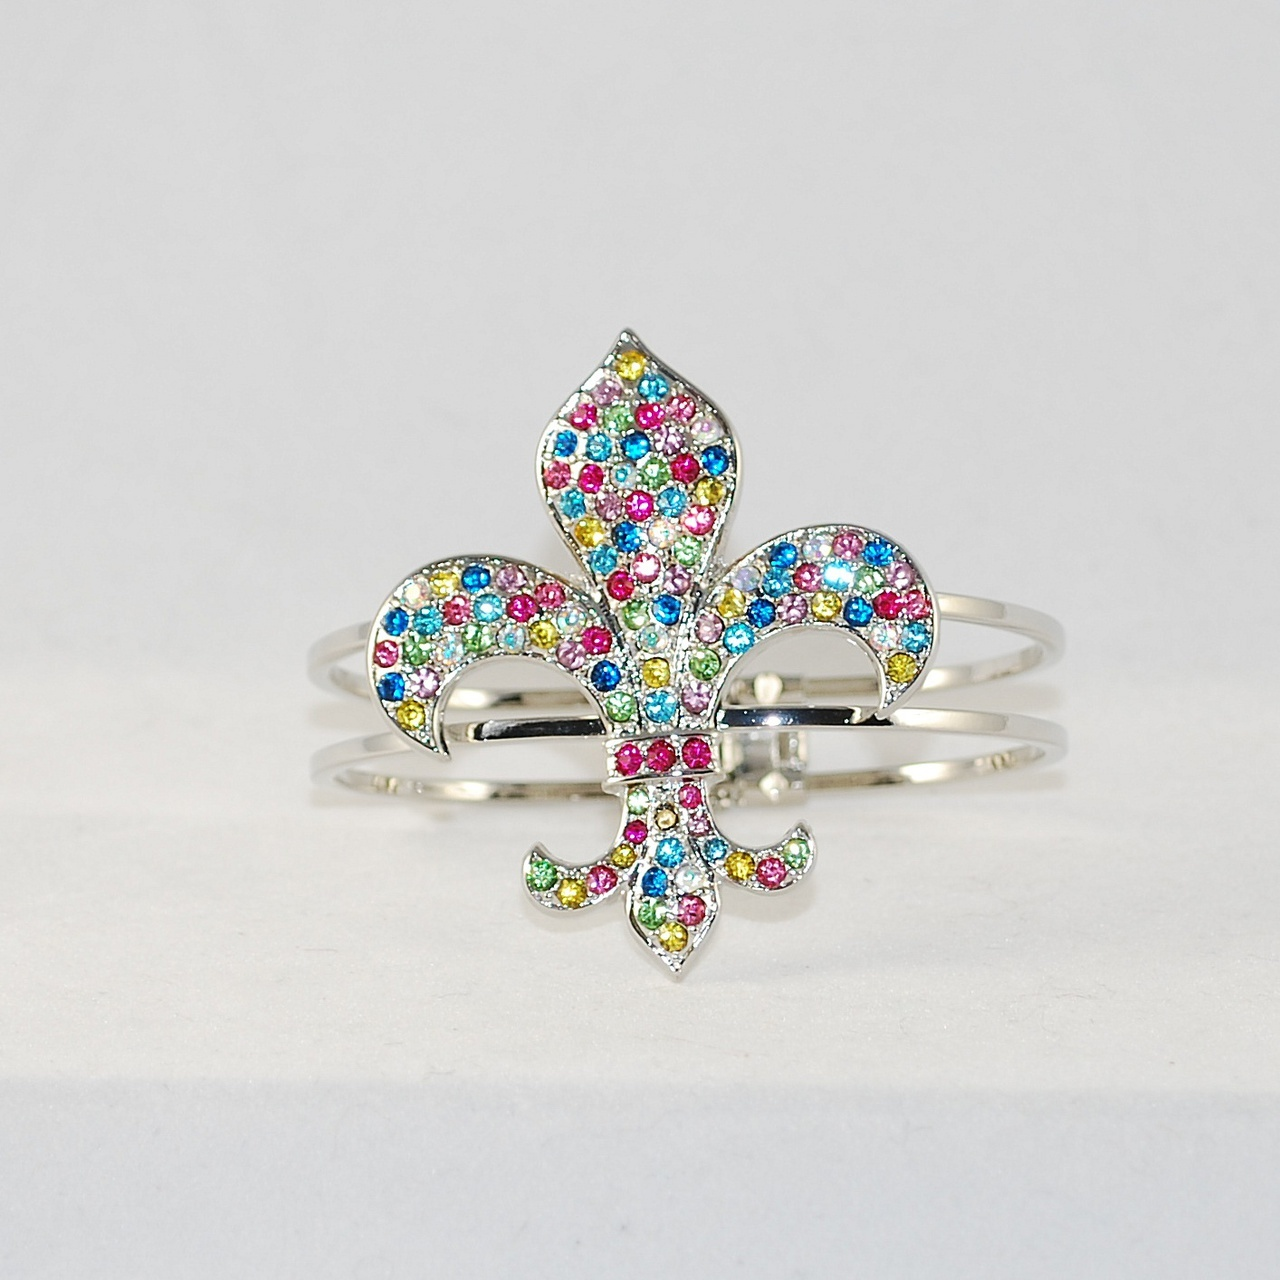 Enchanting Jewelry Creations image 1